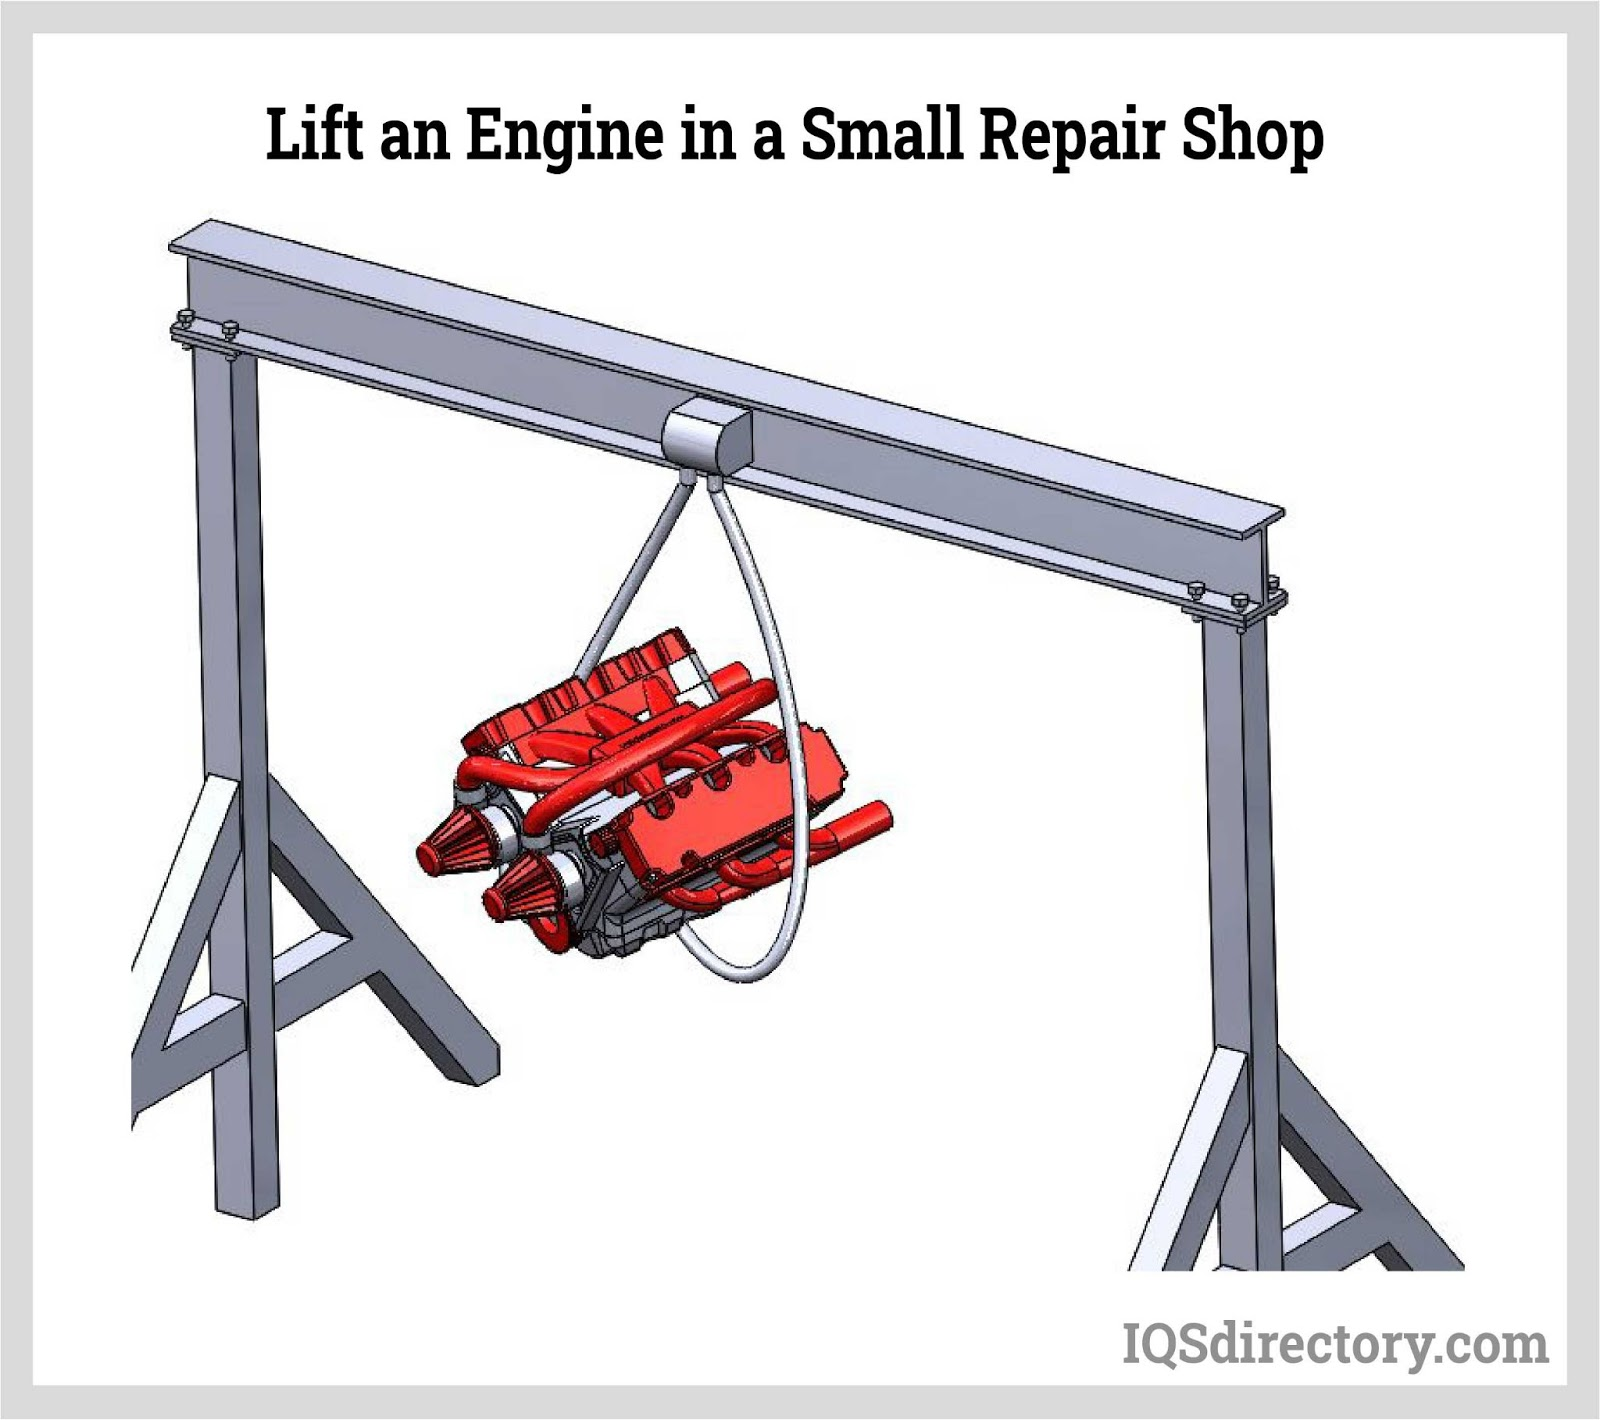 Lift an Engine in a Small Repair Shop